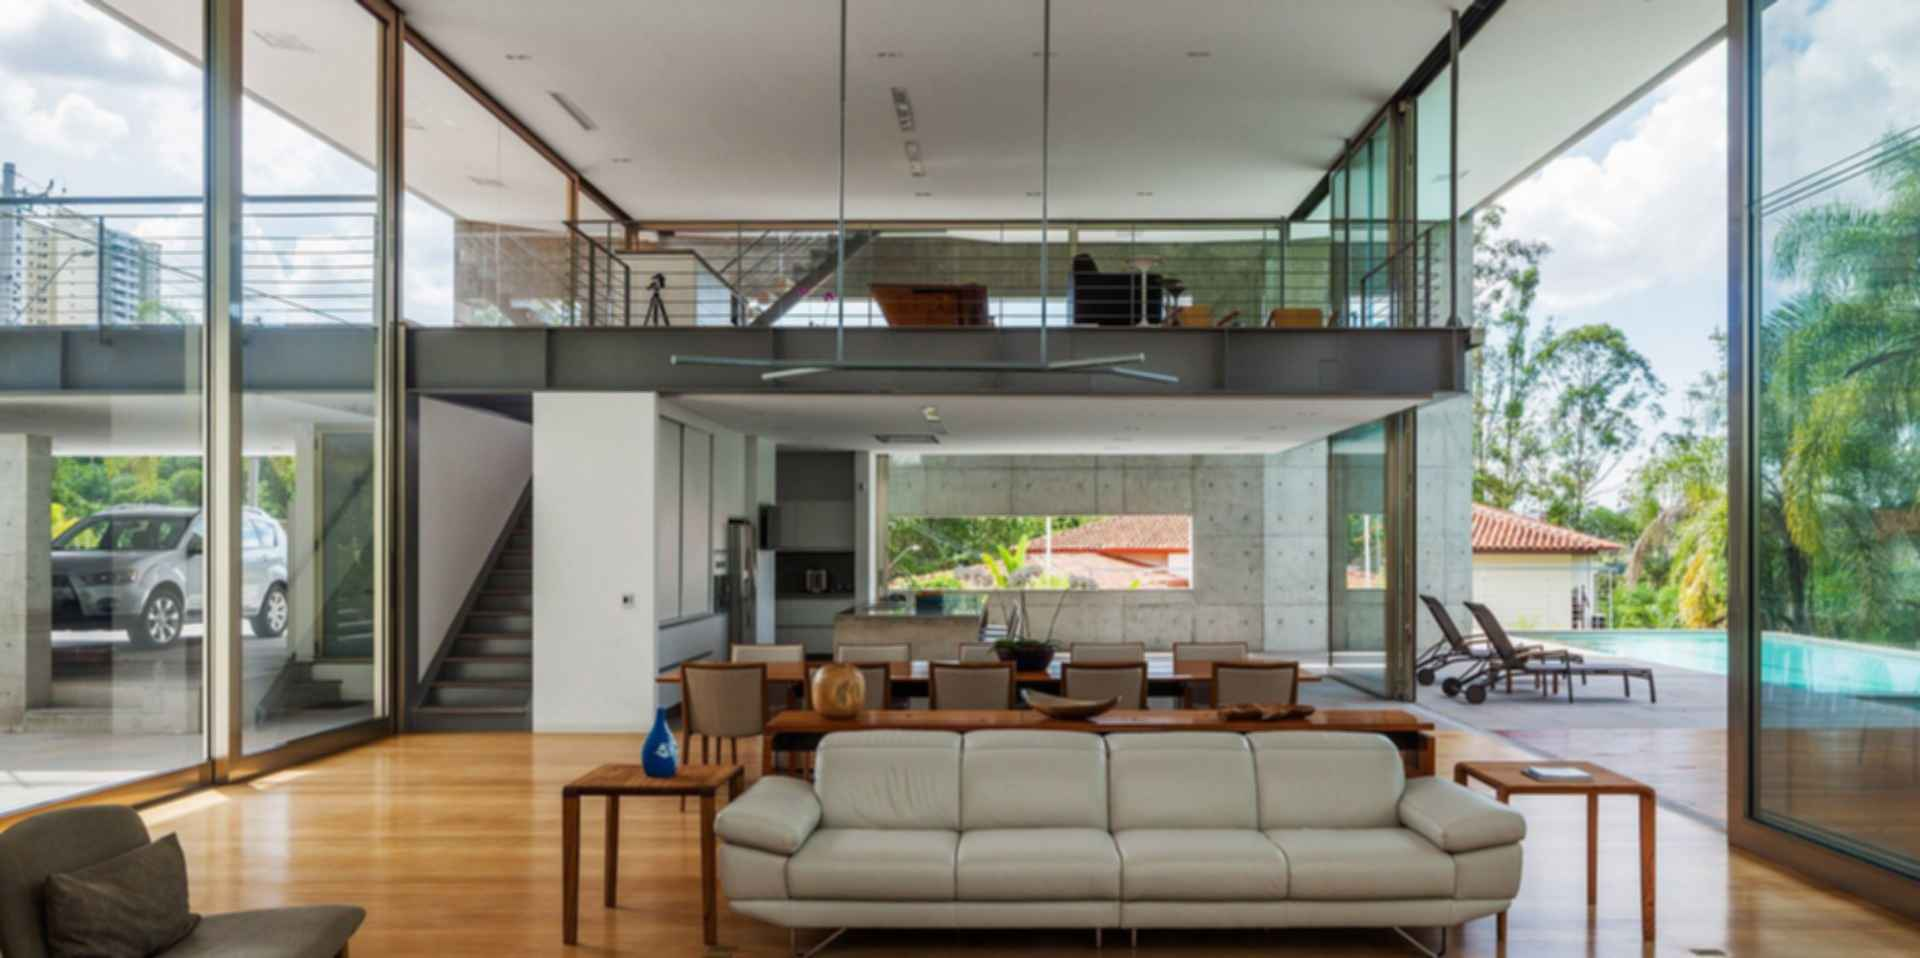 LLM House - Lounge